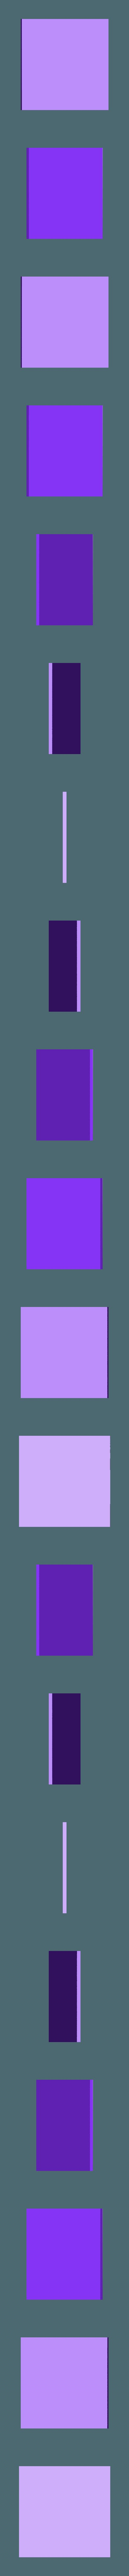 Cuadrados.stl Download free STL file Tablero de ajedrez desplegable • 3D print object, alexanderegido